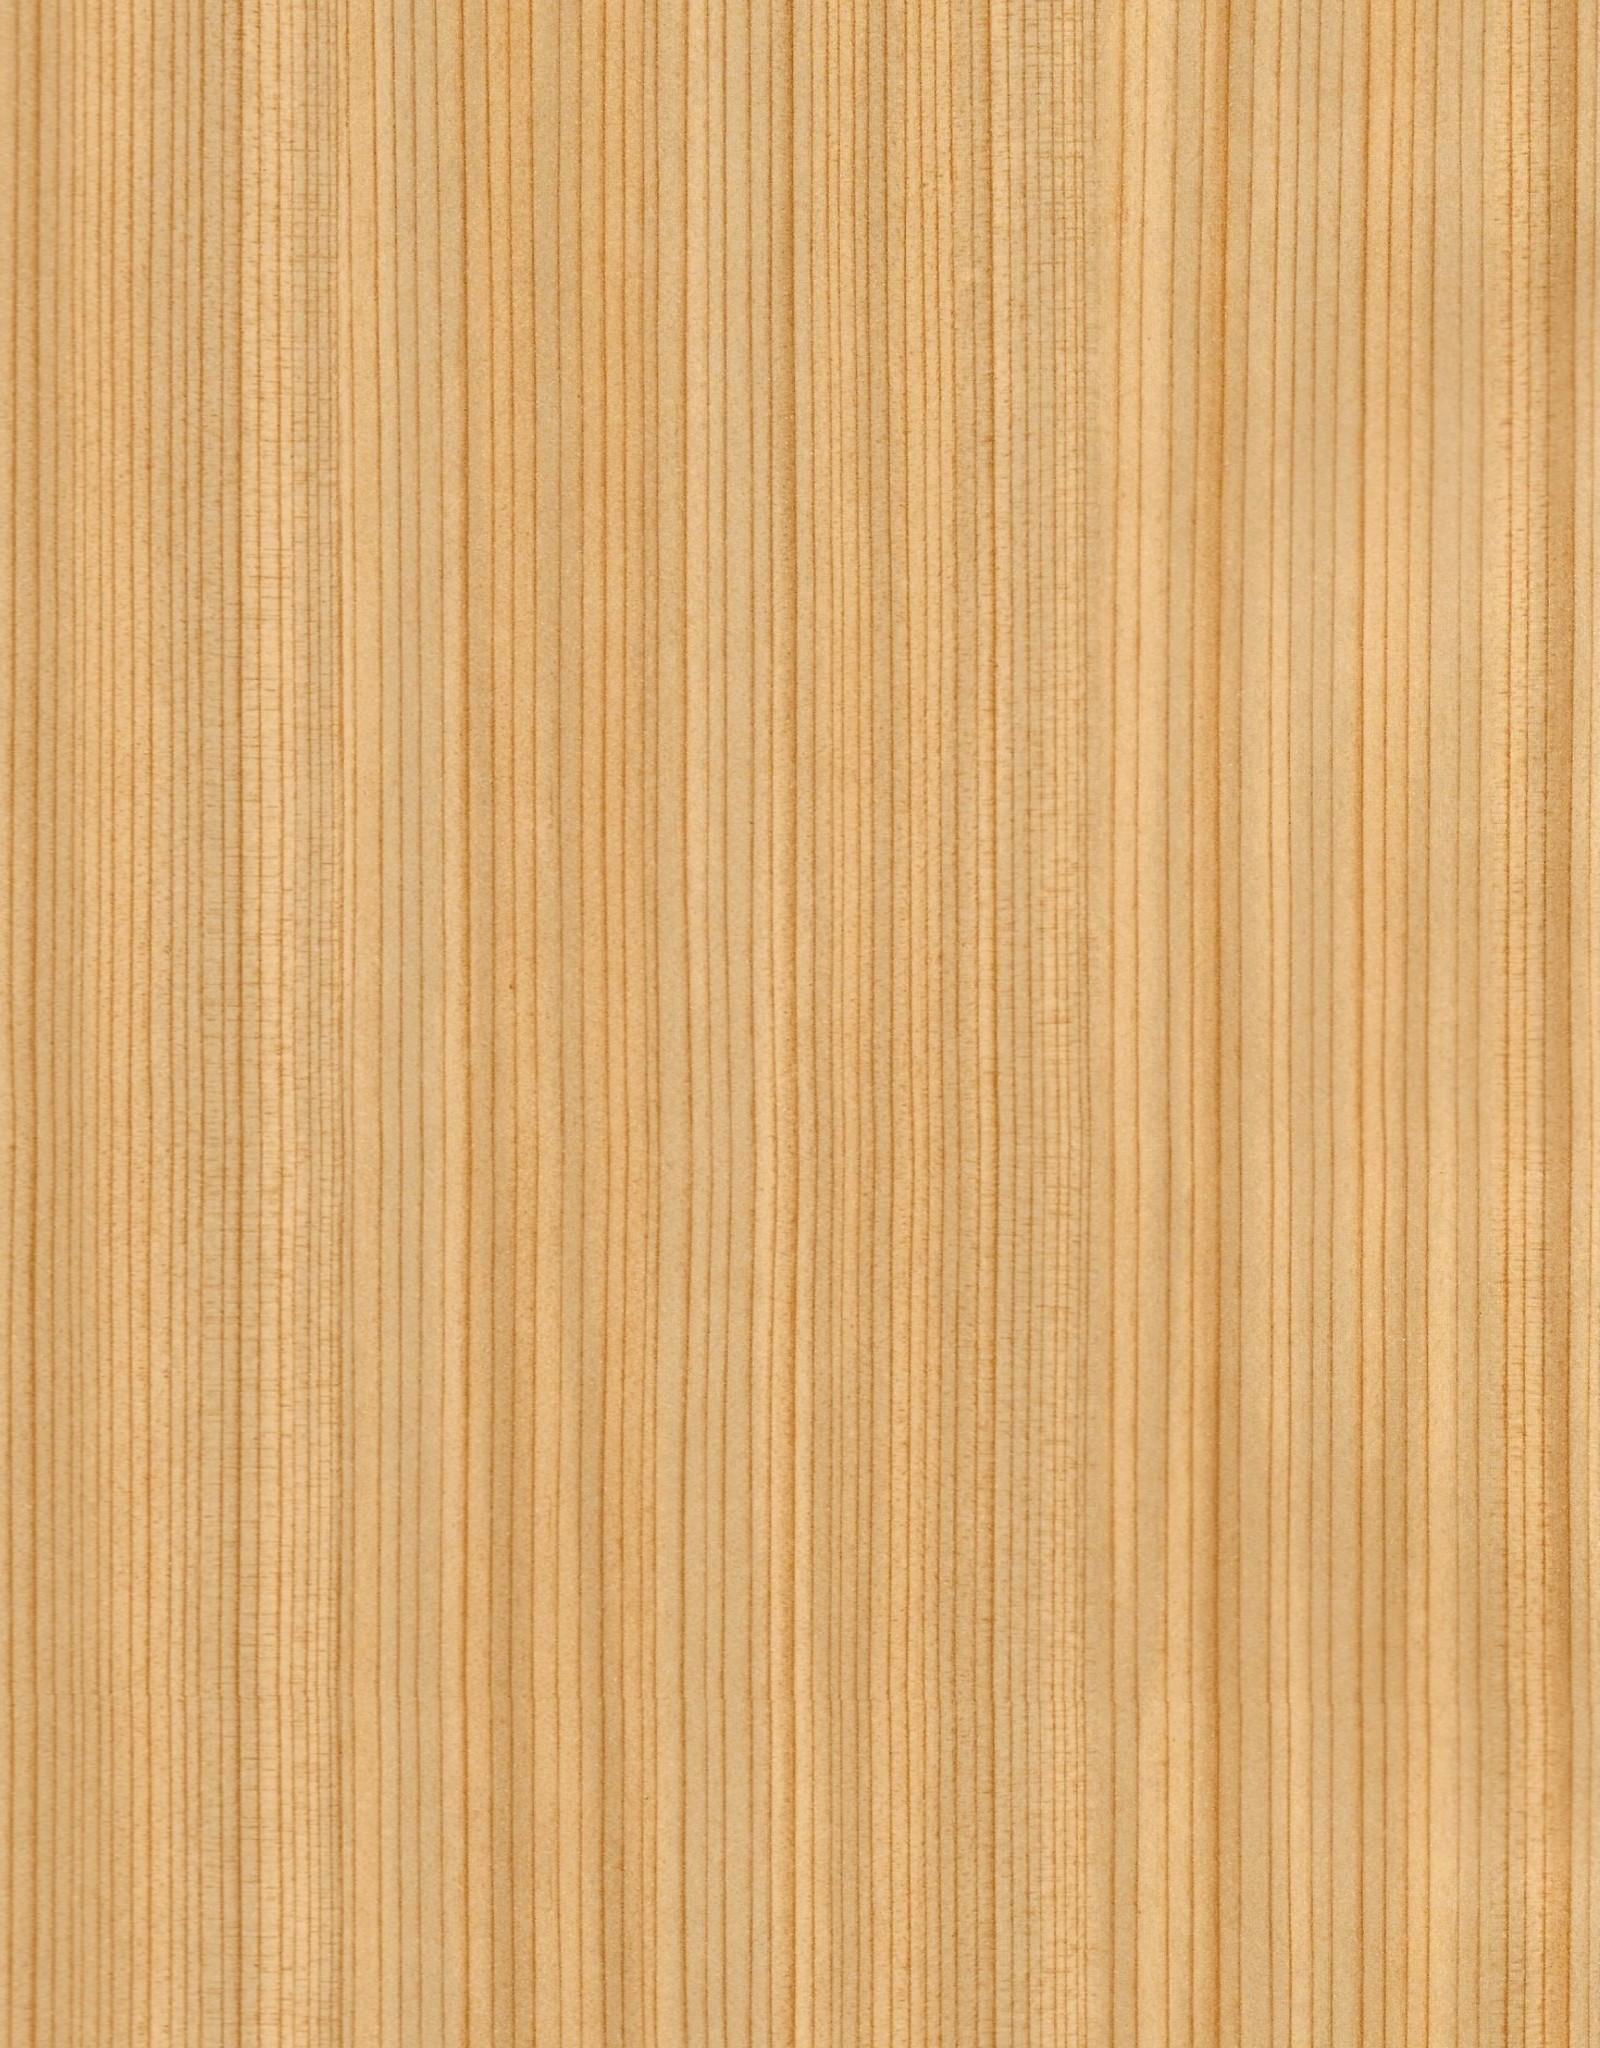 "Japanese Woodgrain Blond 6721, 40"" x 31"""